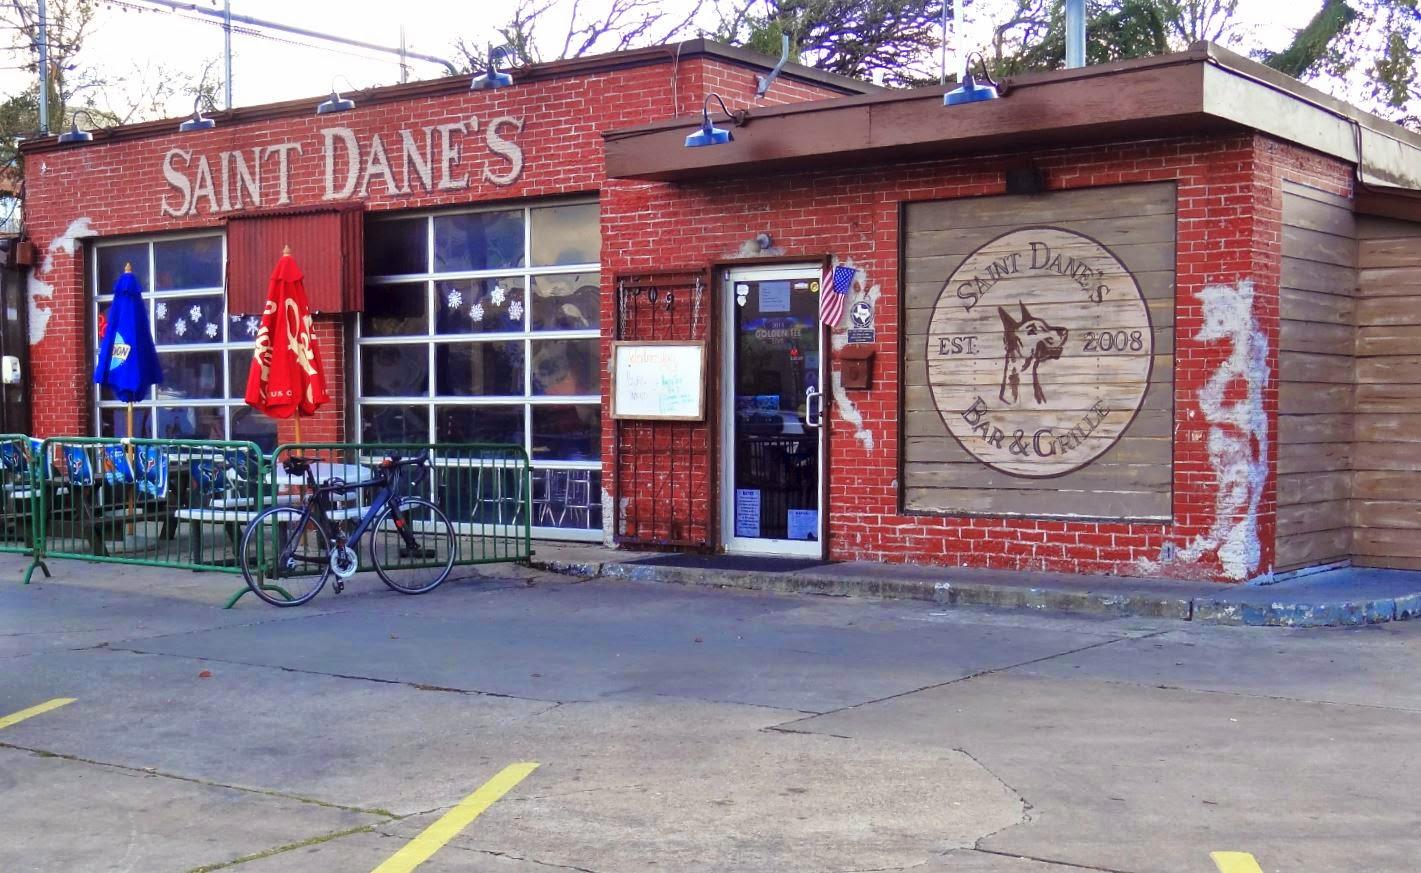 Saint Dane's Bar & Grille